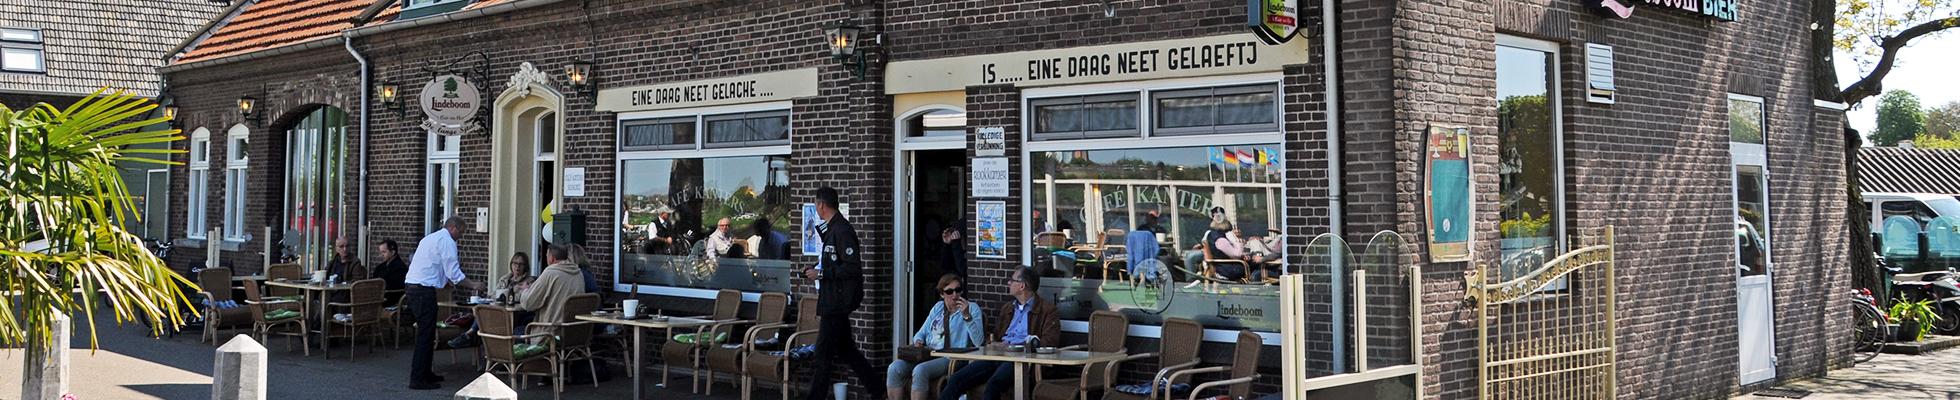 Cafe Kanters in Ool Herten